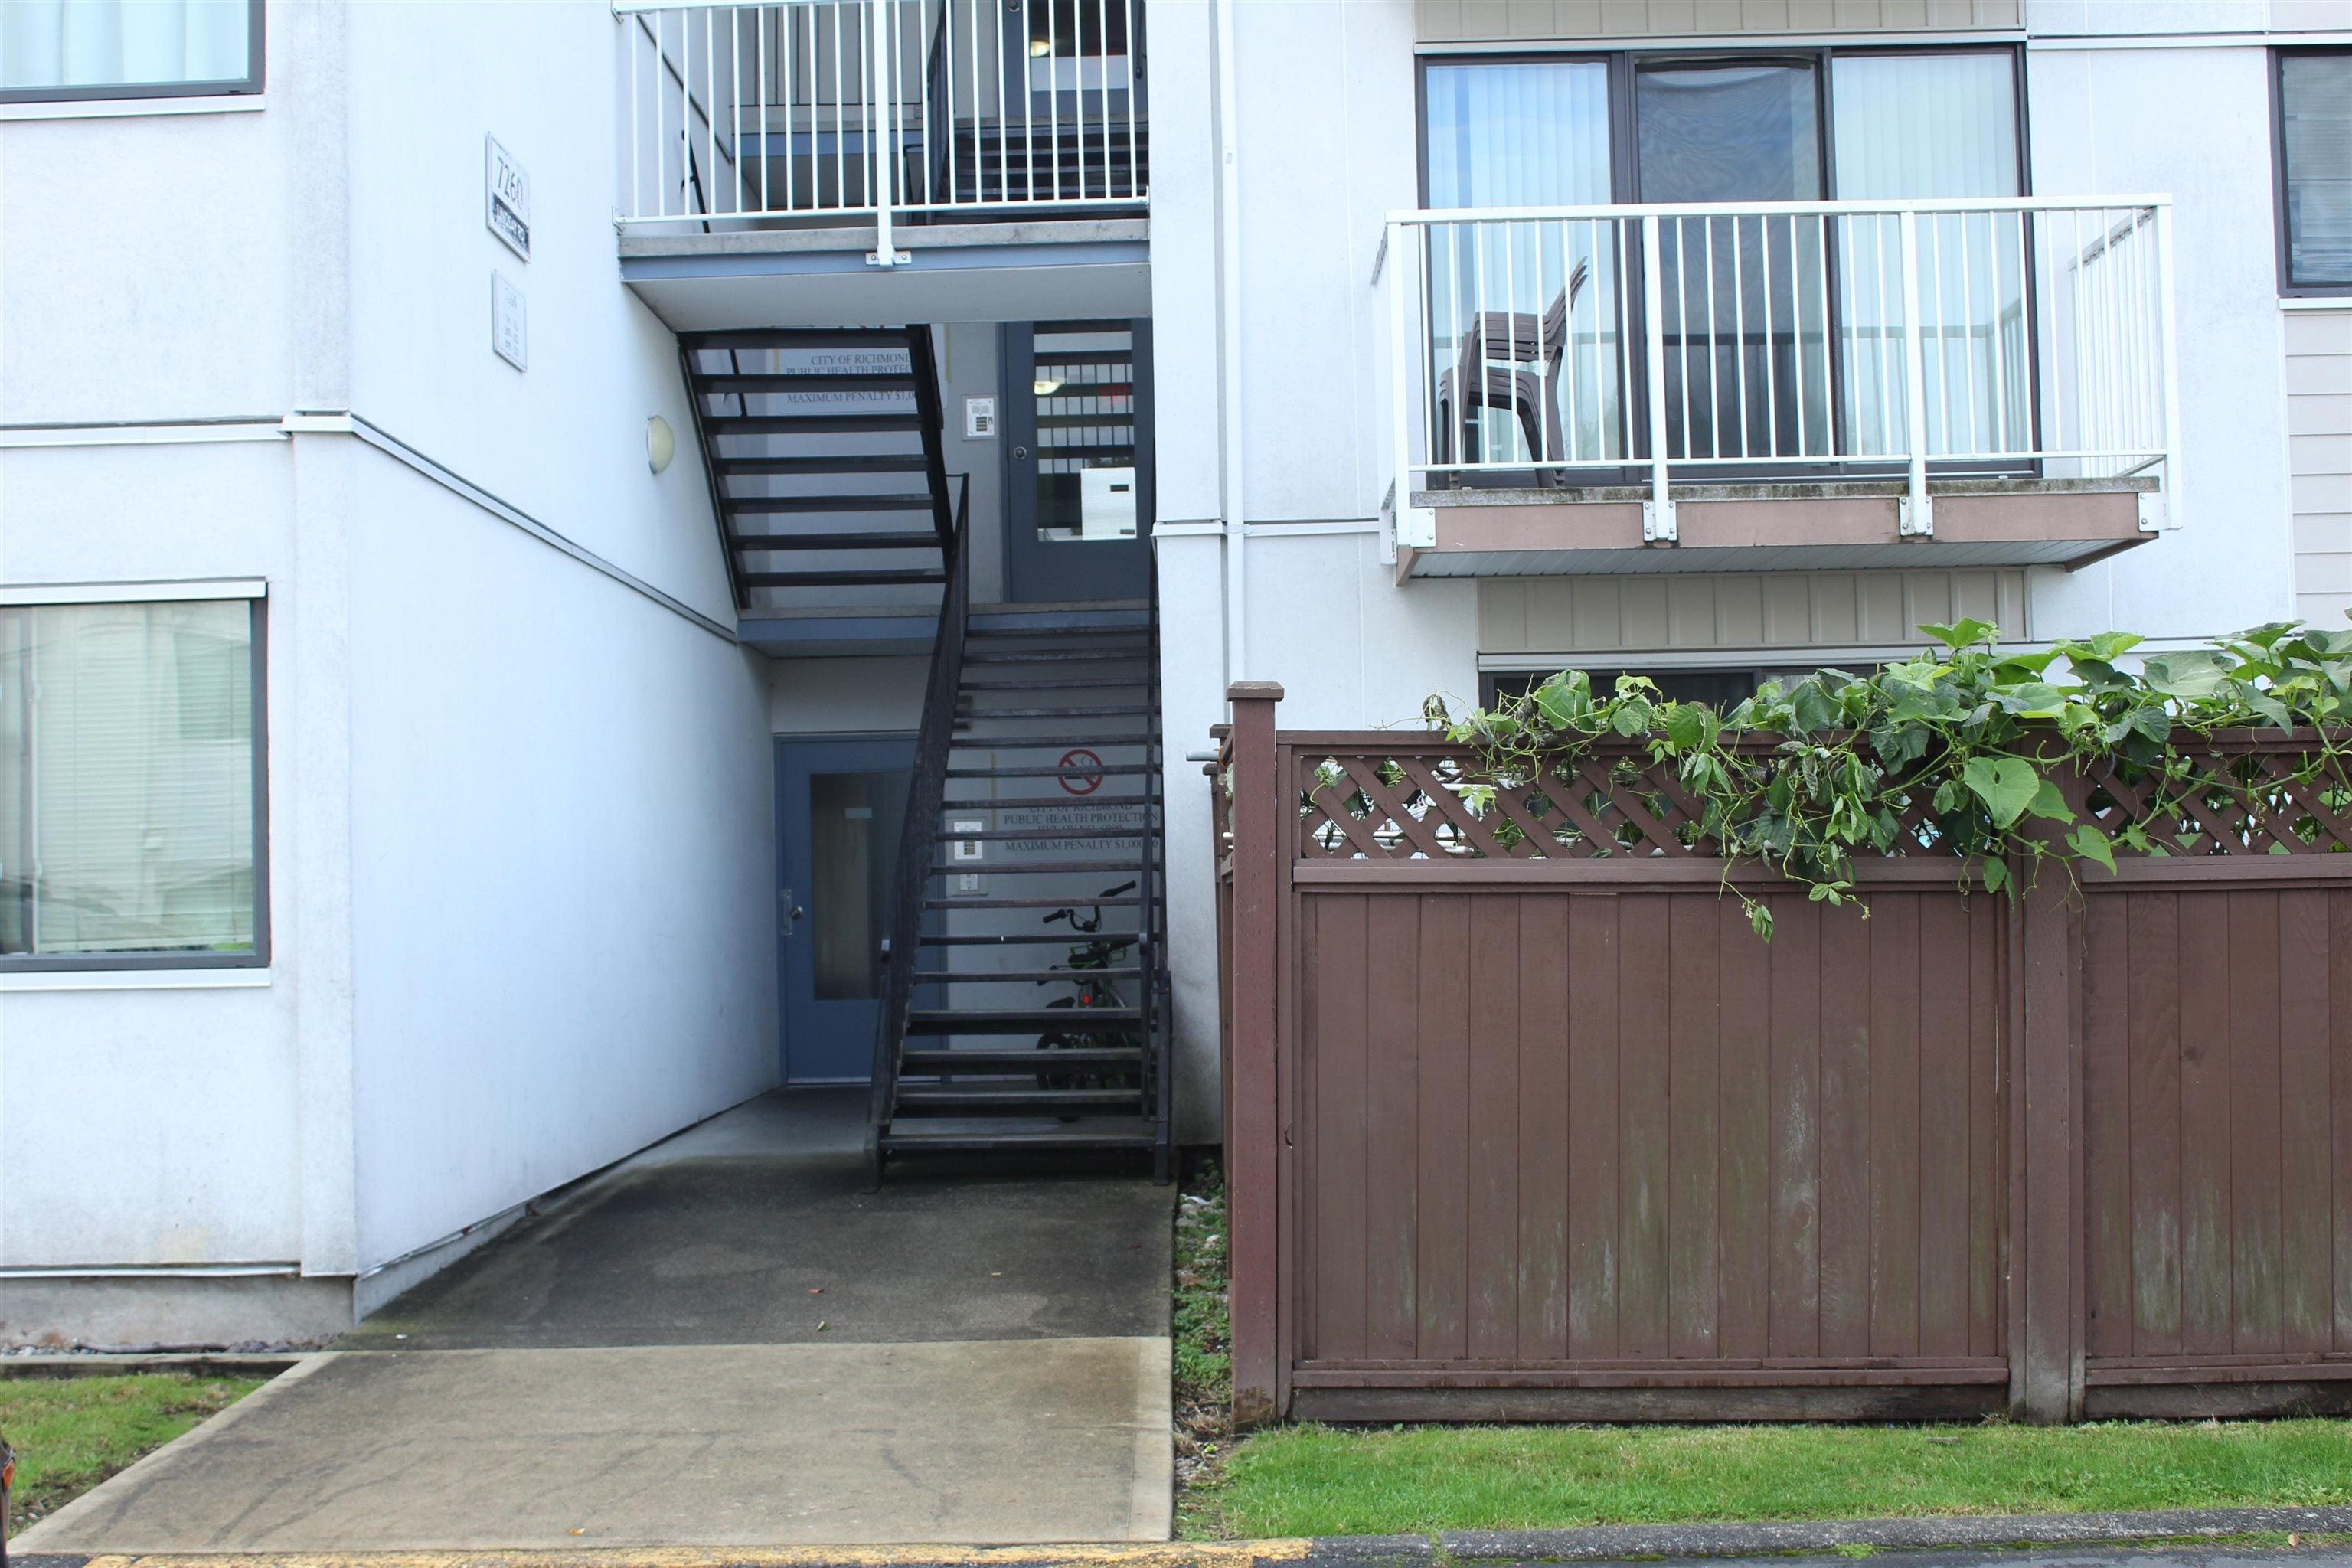 109 7260 LINDSAY ROAD - Granville Apartment/Condo for sale, 2 Bedrooms (R2622875)